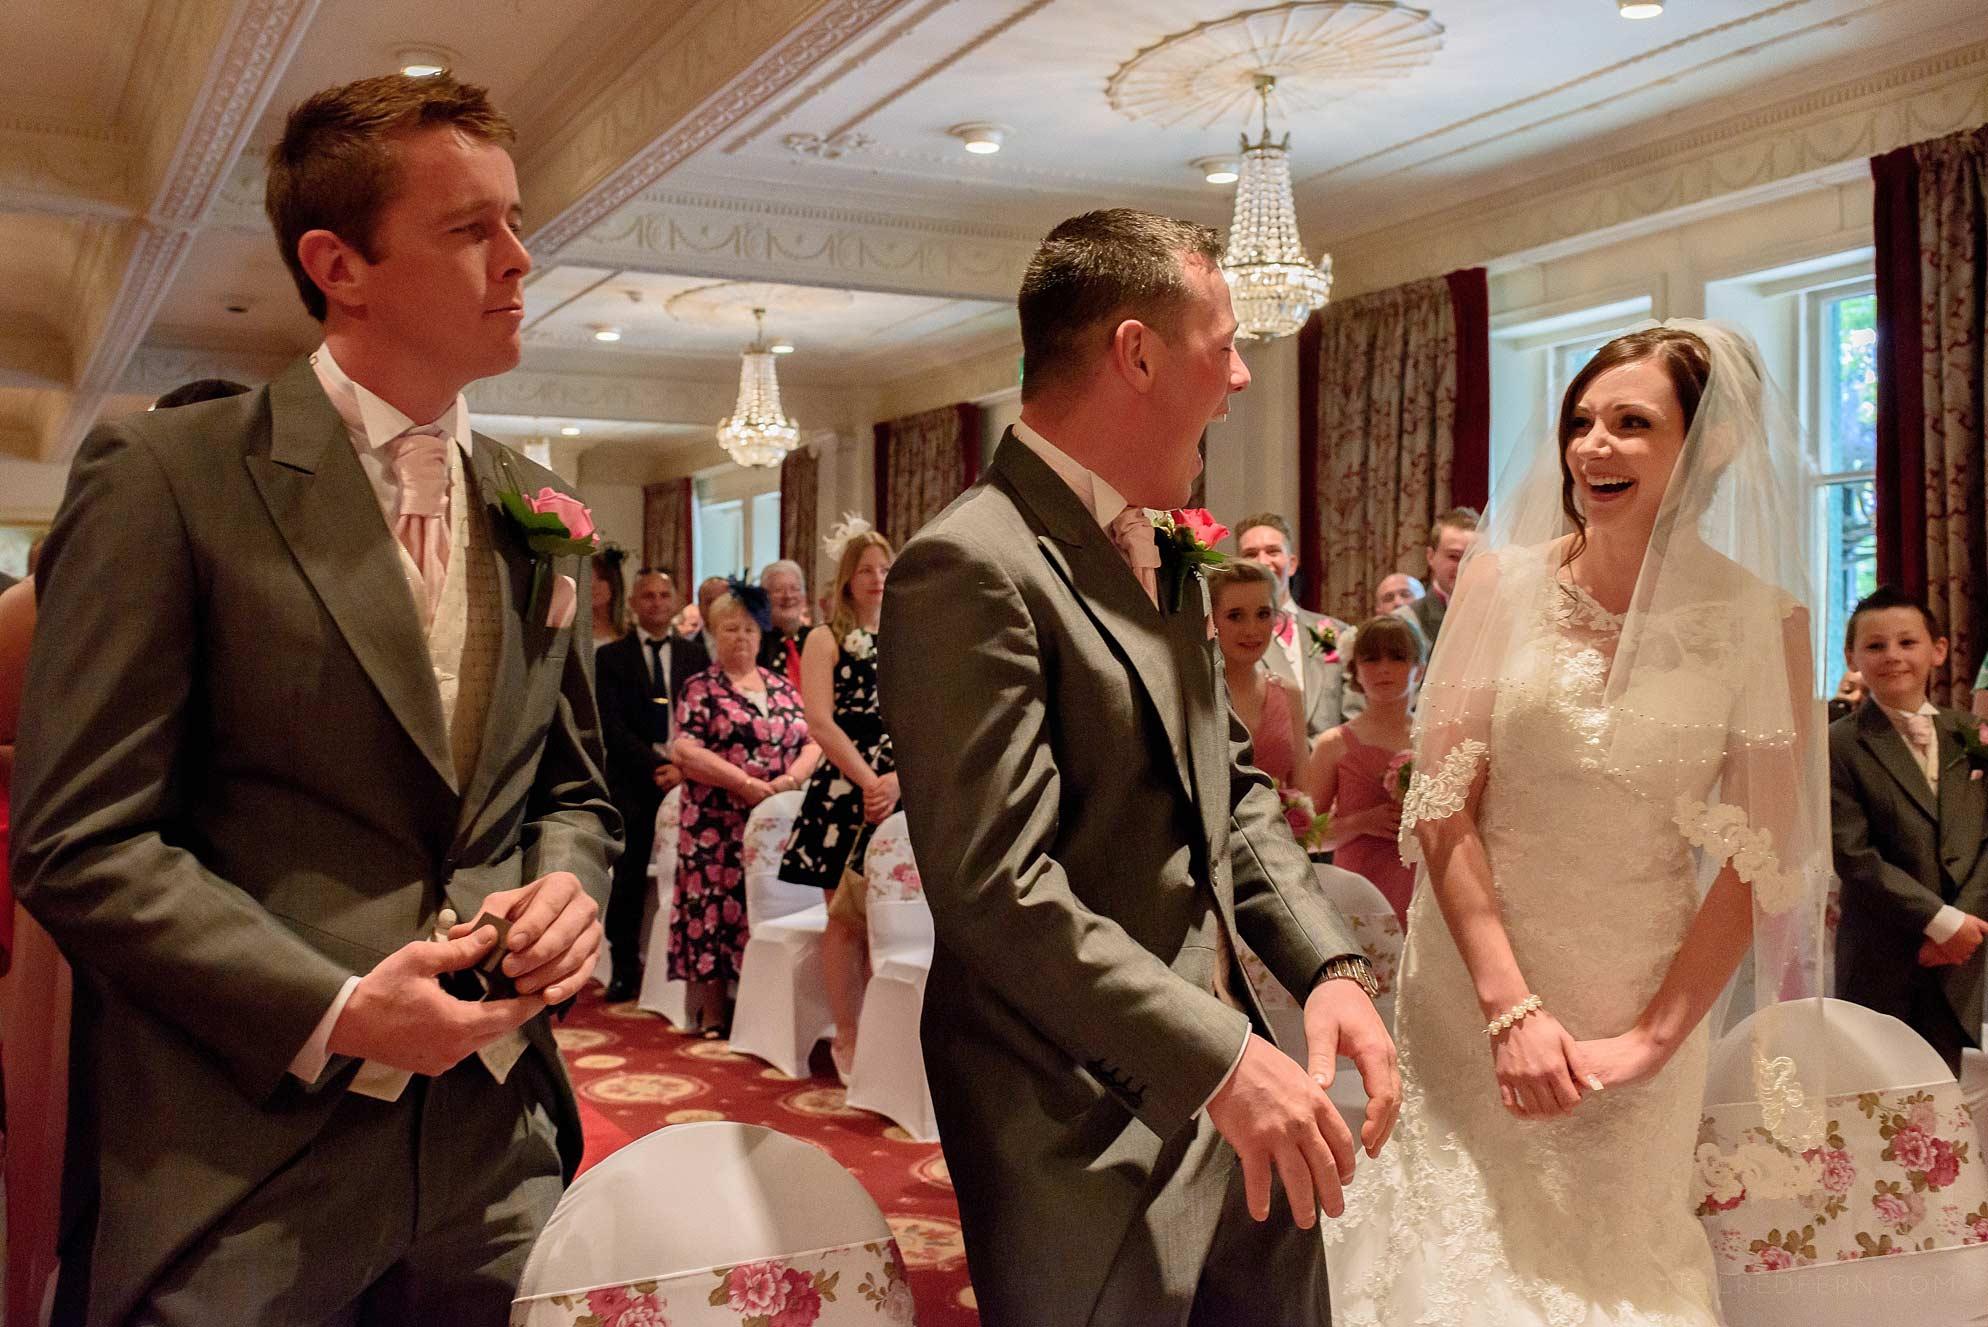 Metropole-Hotel-Llandrindod-Wells-wedding-18